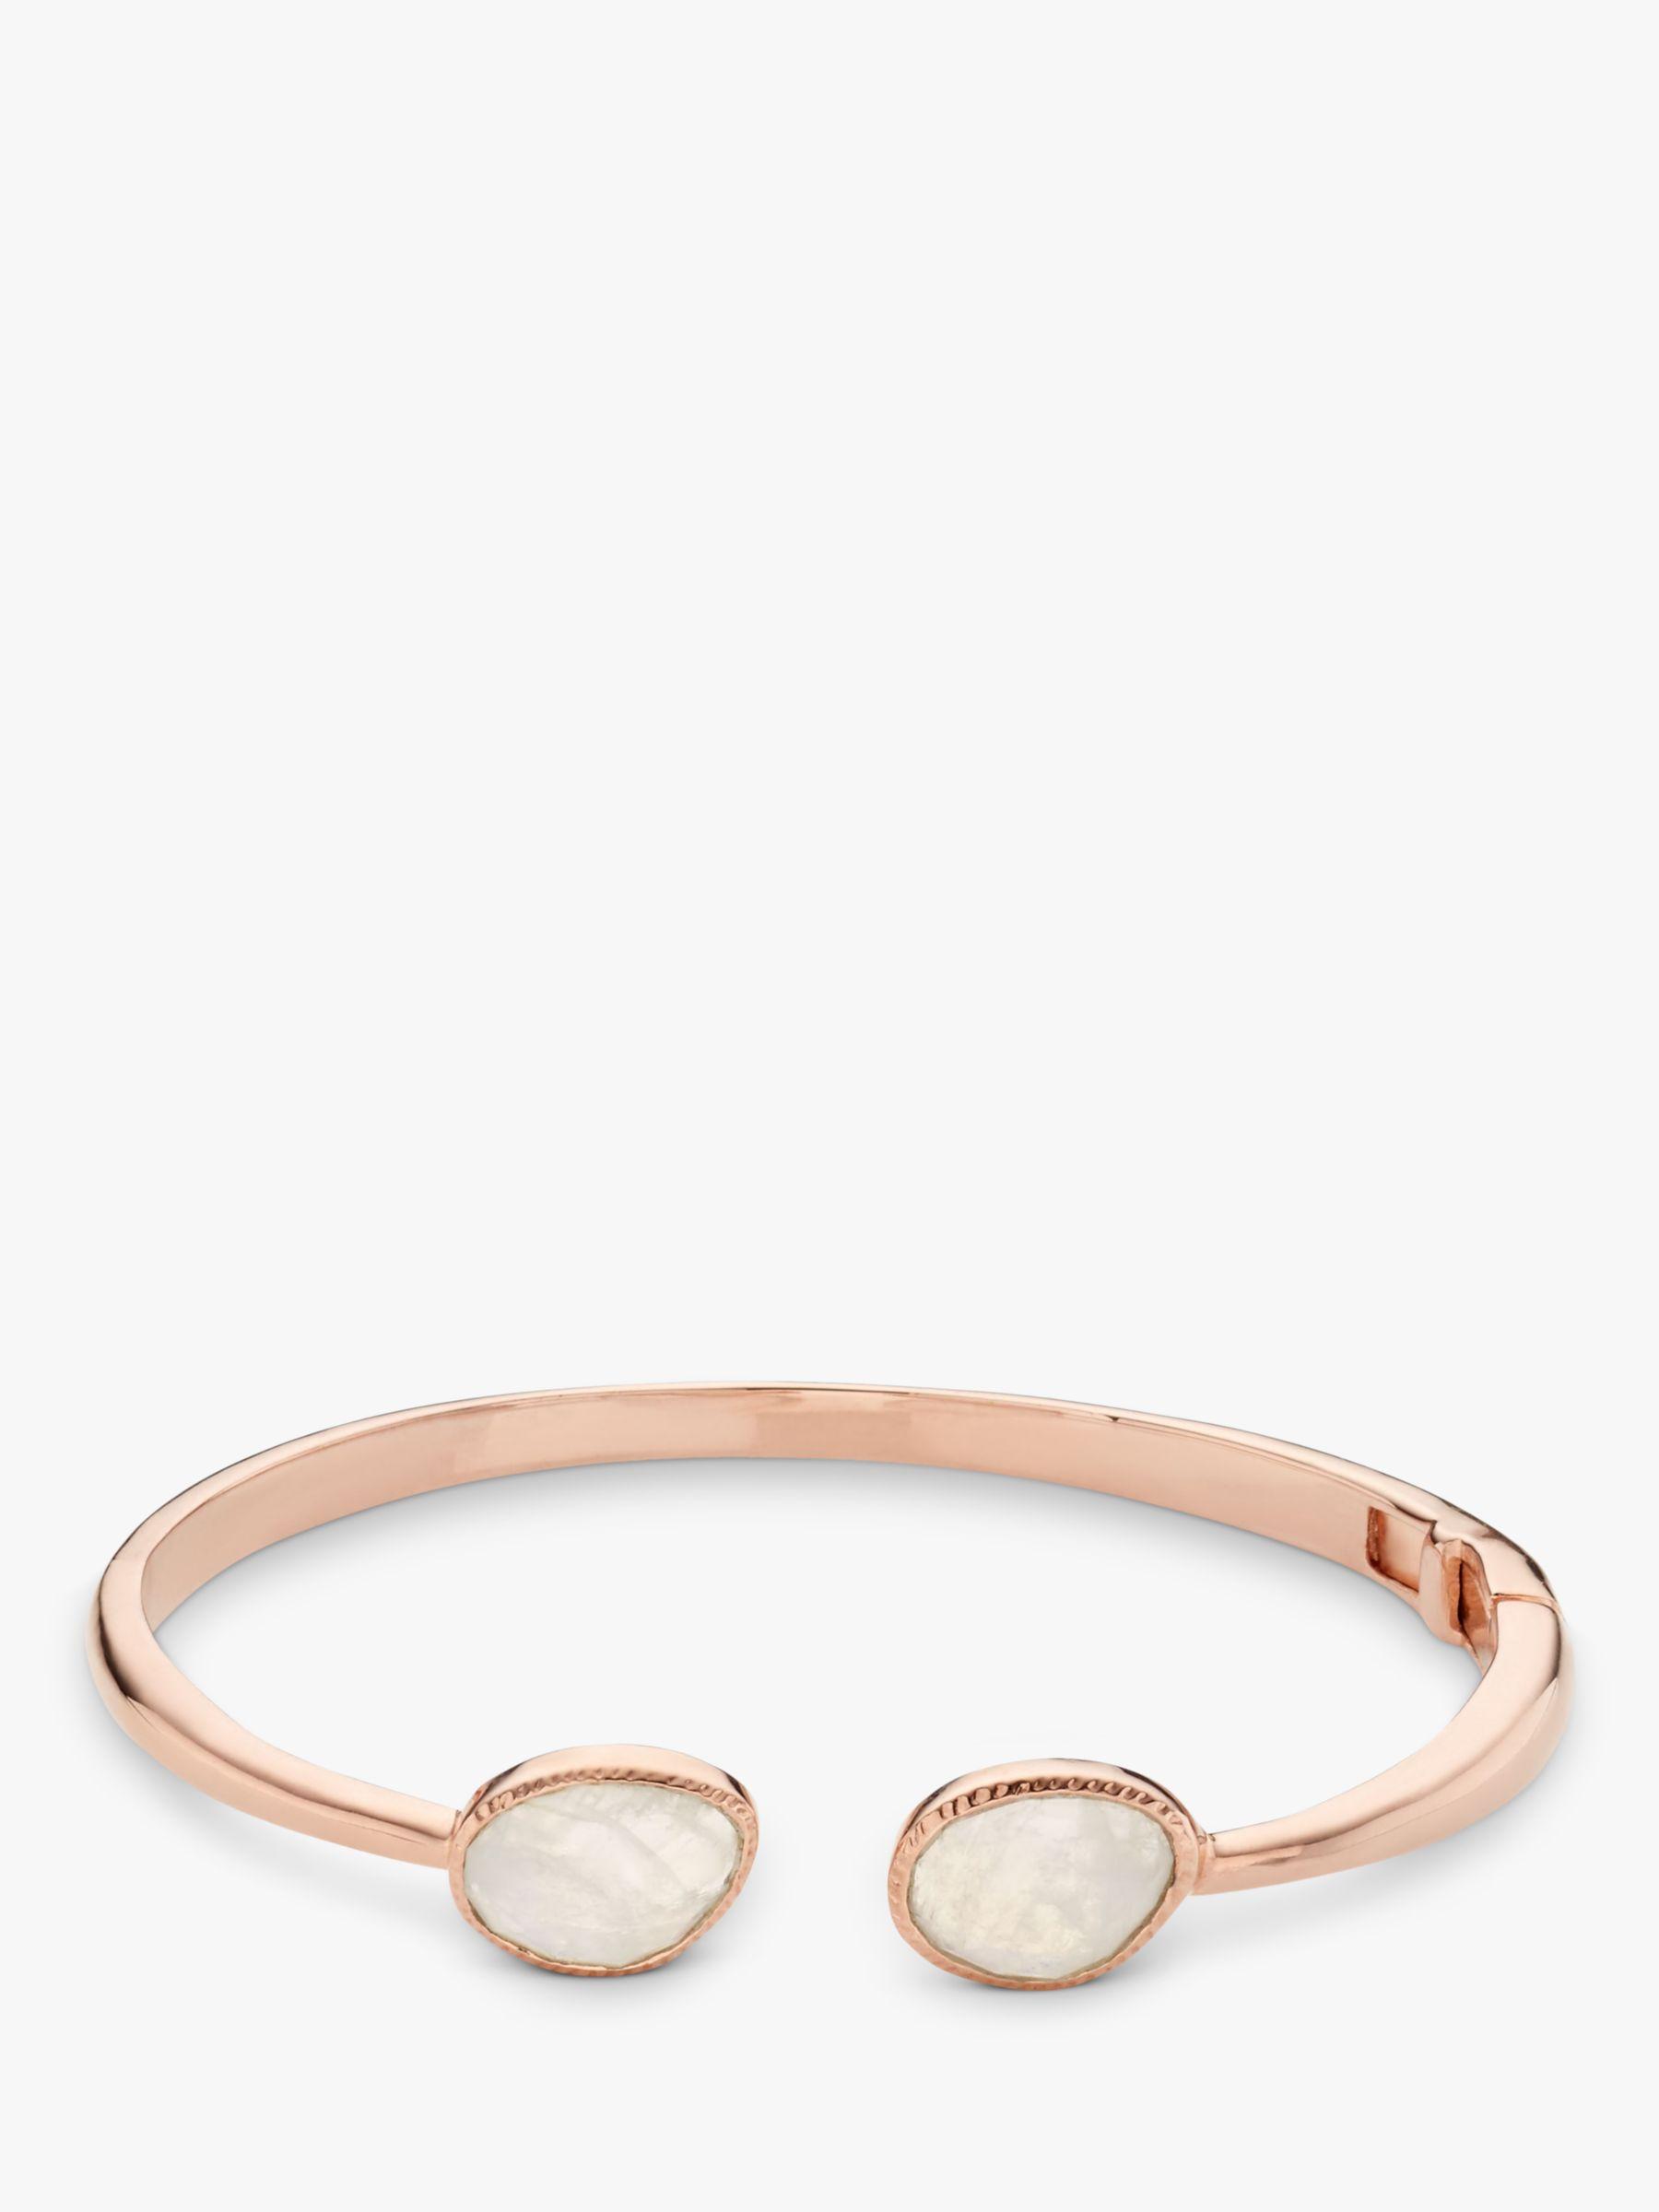 John Lewis Gemstones John Lewis Gemstones Rainbow Moonstone Hinged Cuff, Rose Gold/Multi